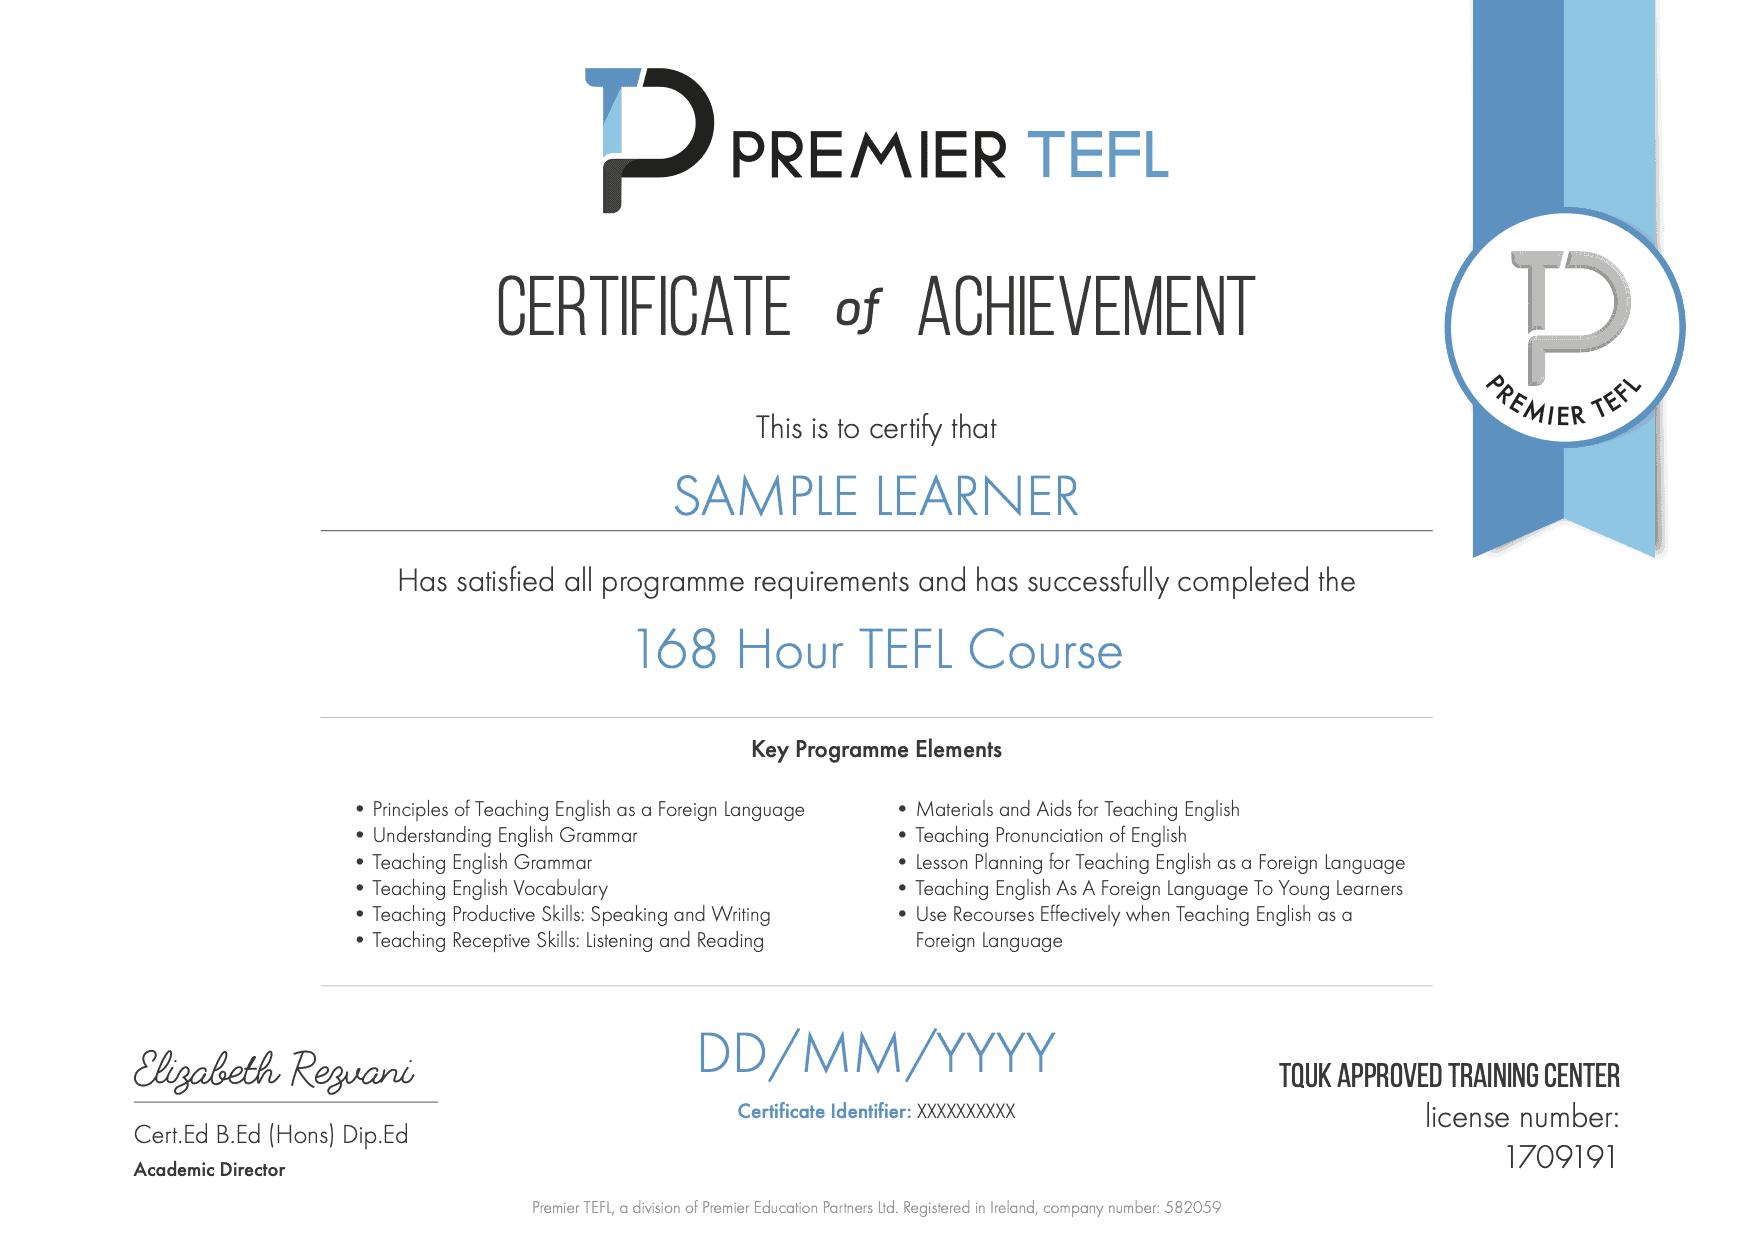 Premier TEFL 168 Hour TEFL Course Certificate Sample